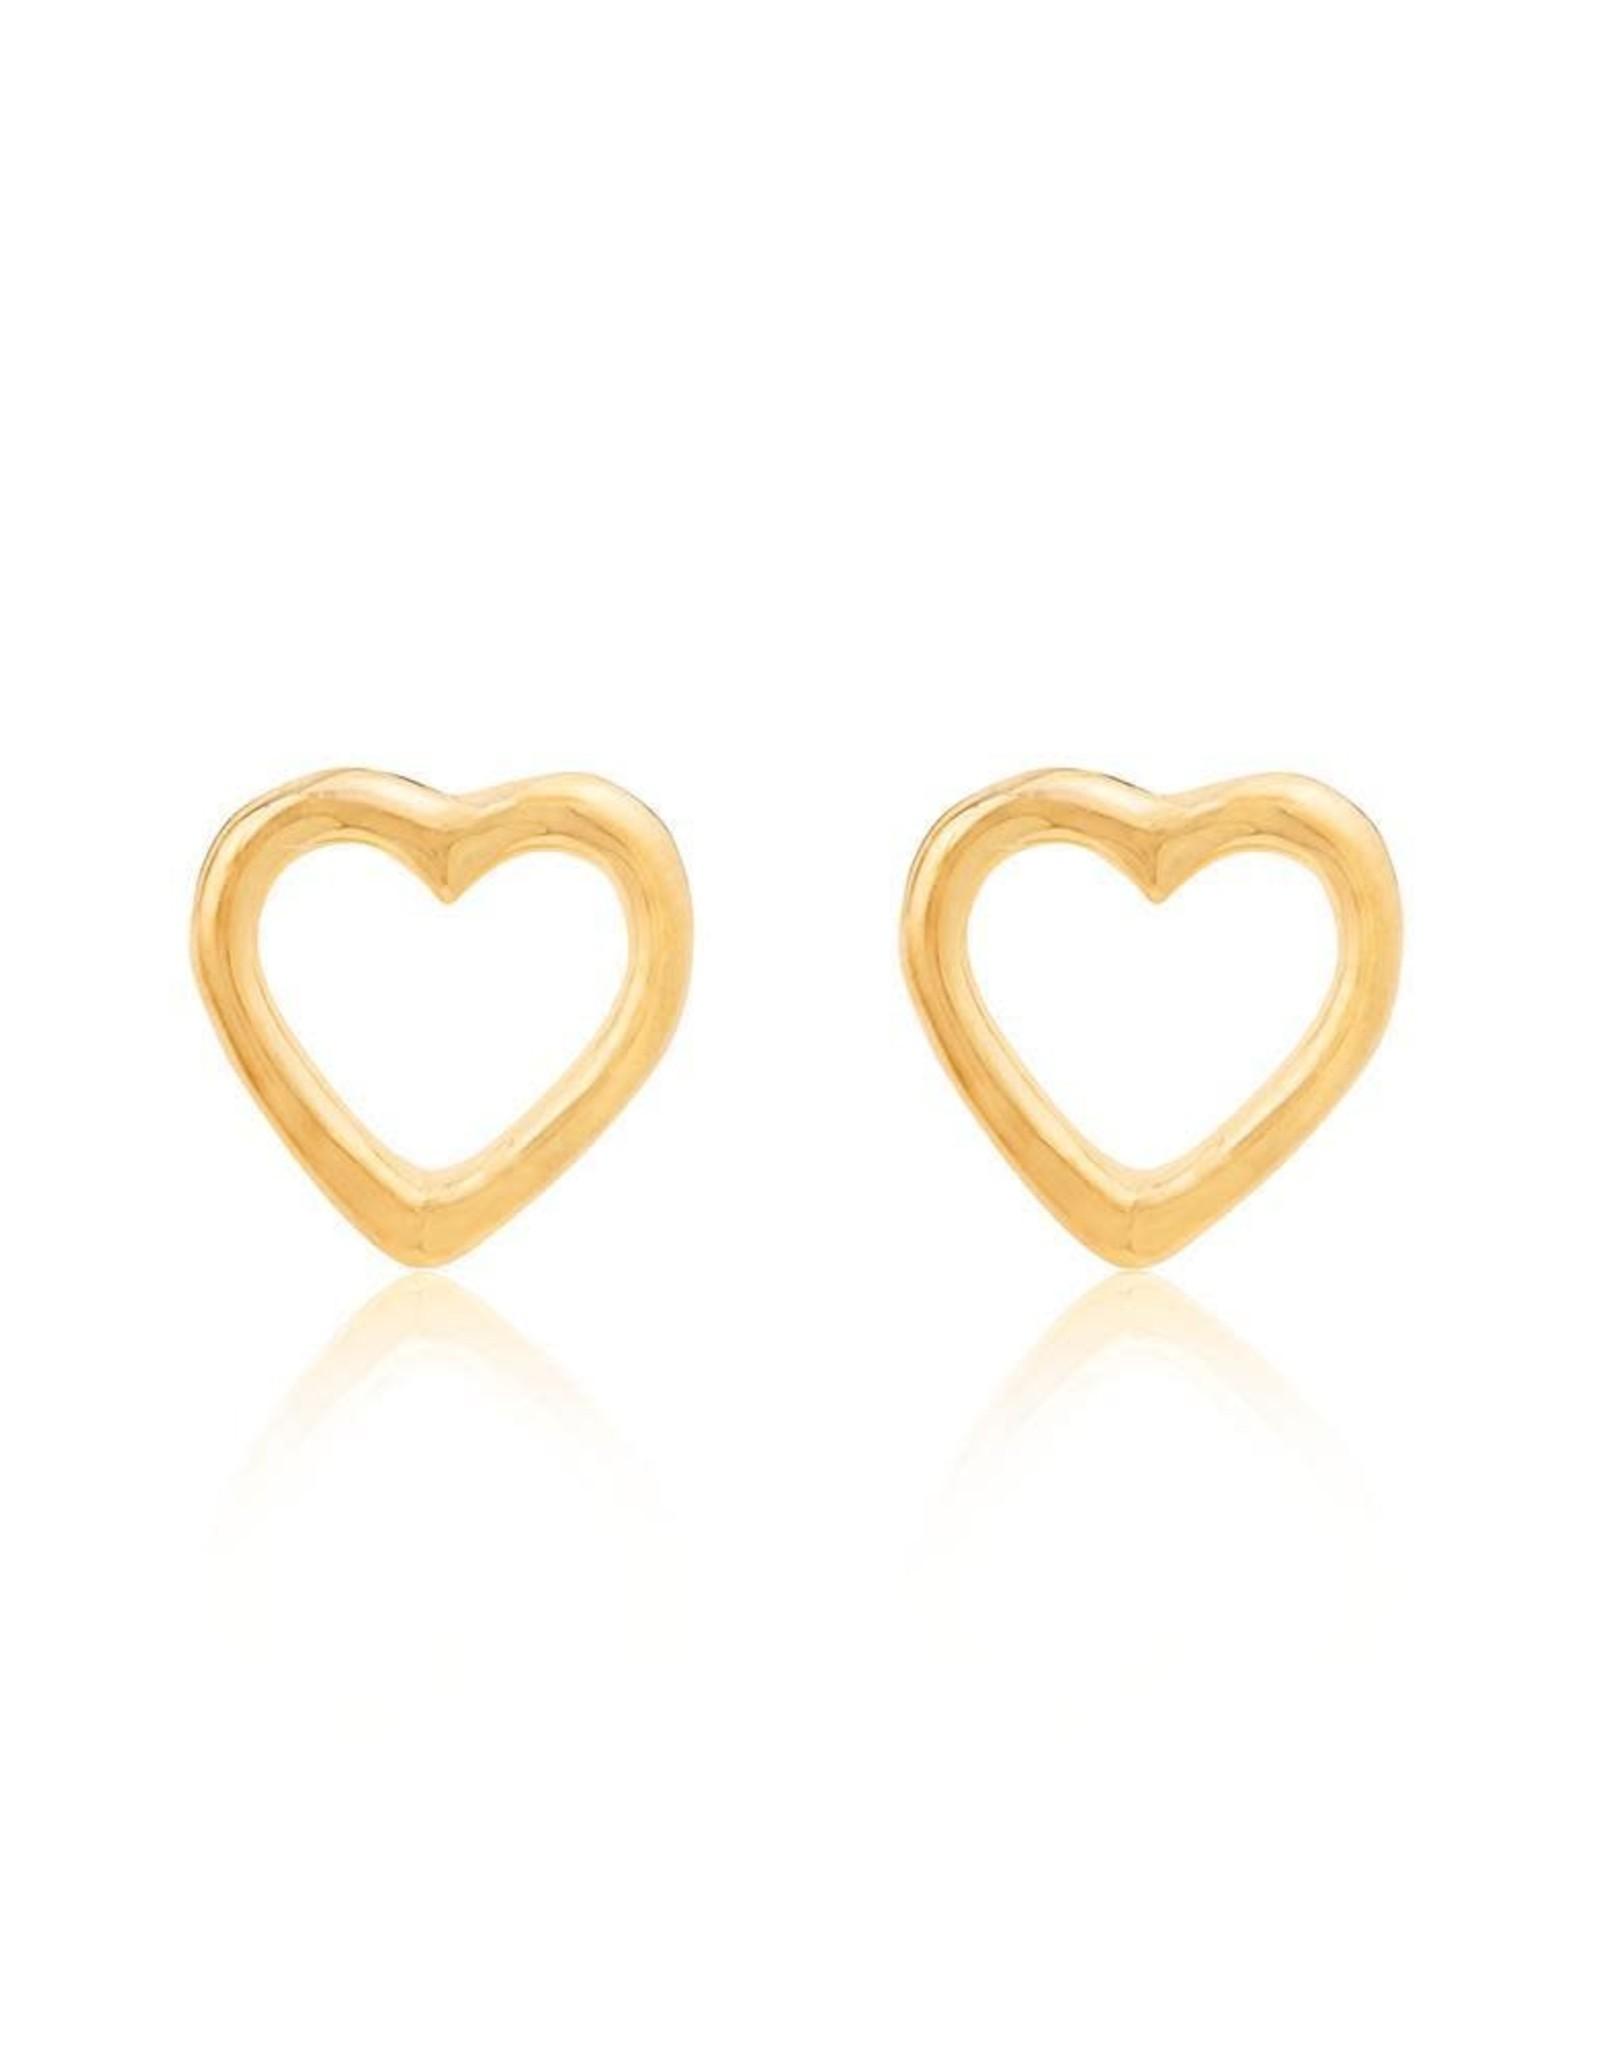 Linda Tahija Open Heart Stud Earrings